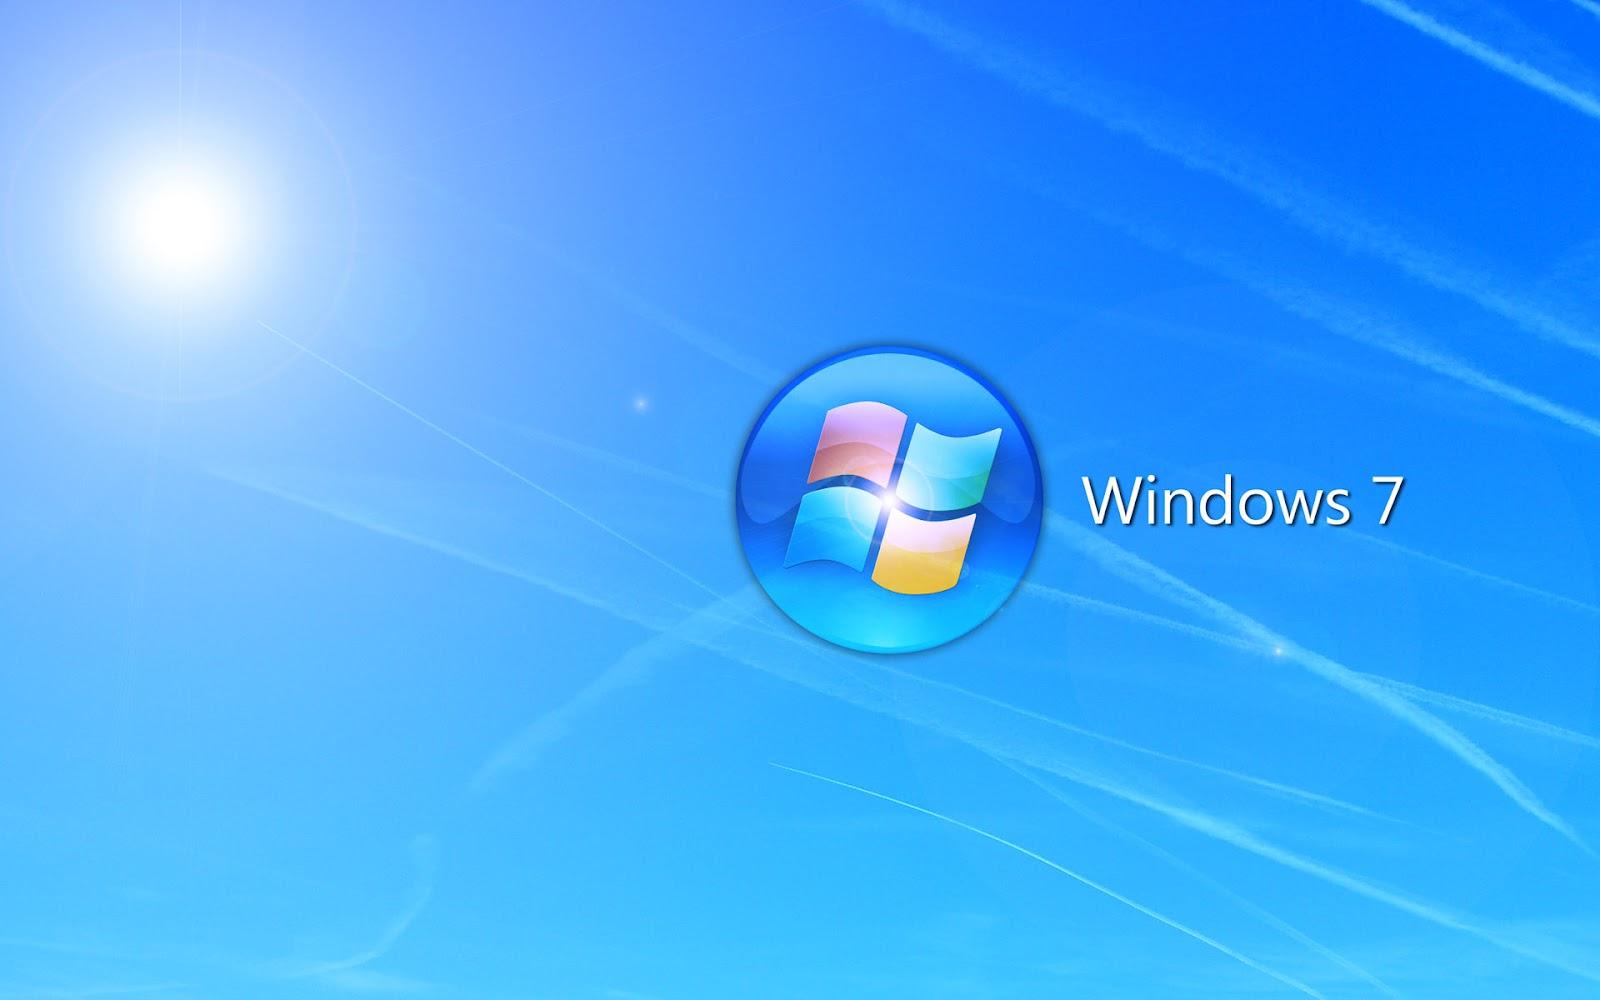 http://4.bp.blogspot.com/-pXF80ymS1Gw/UBVmVLWfiQI/AAAAAAAAD9Q/7v1u2-94Bhg/s1600/windows+7+hd+wallpapers+%2823%29.jpg